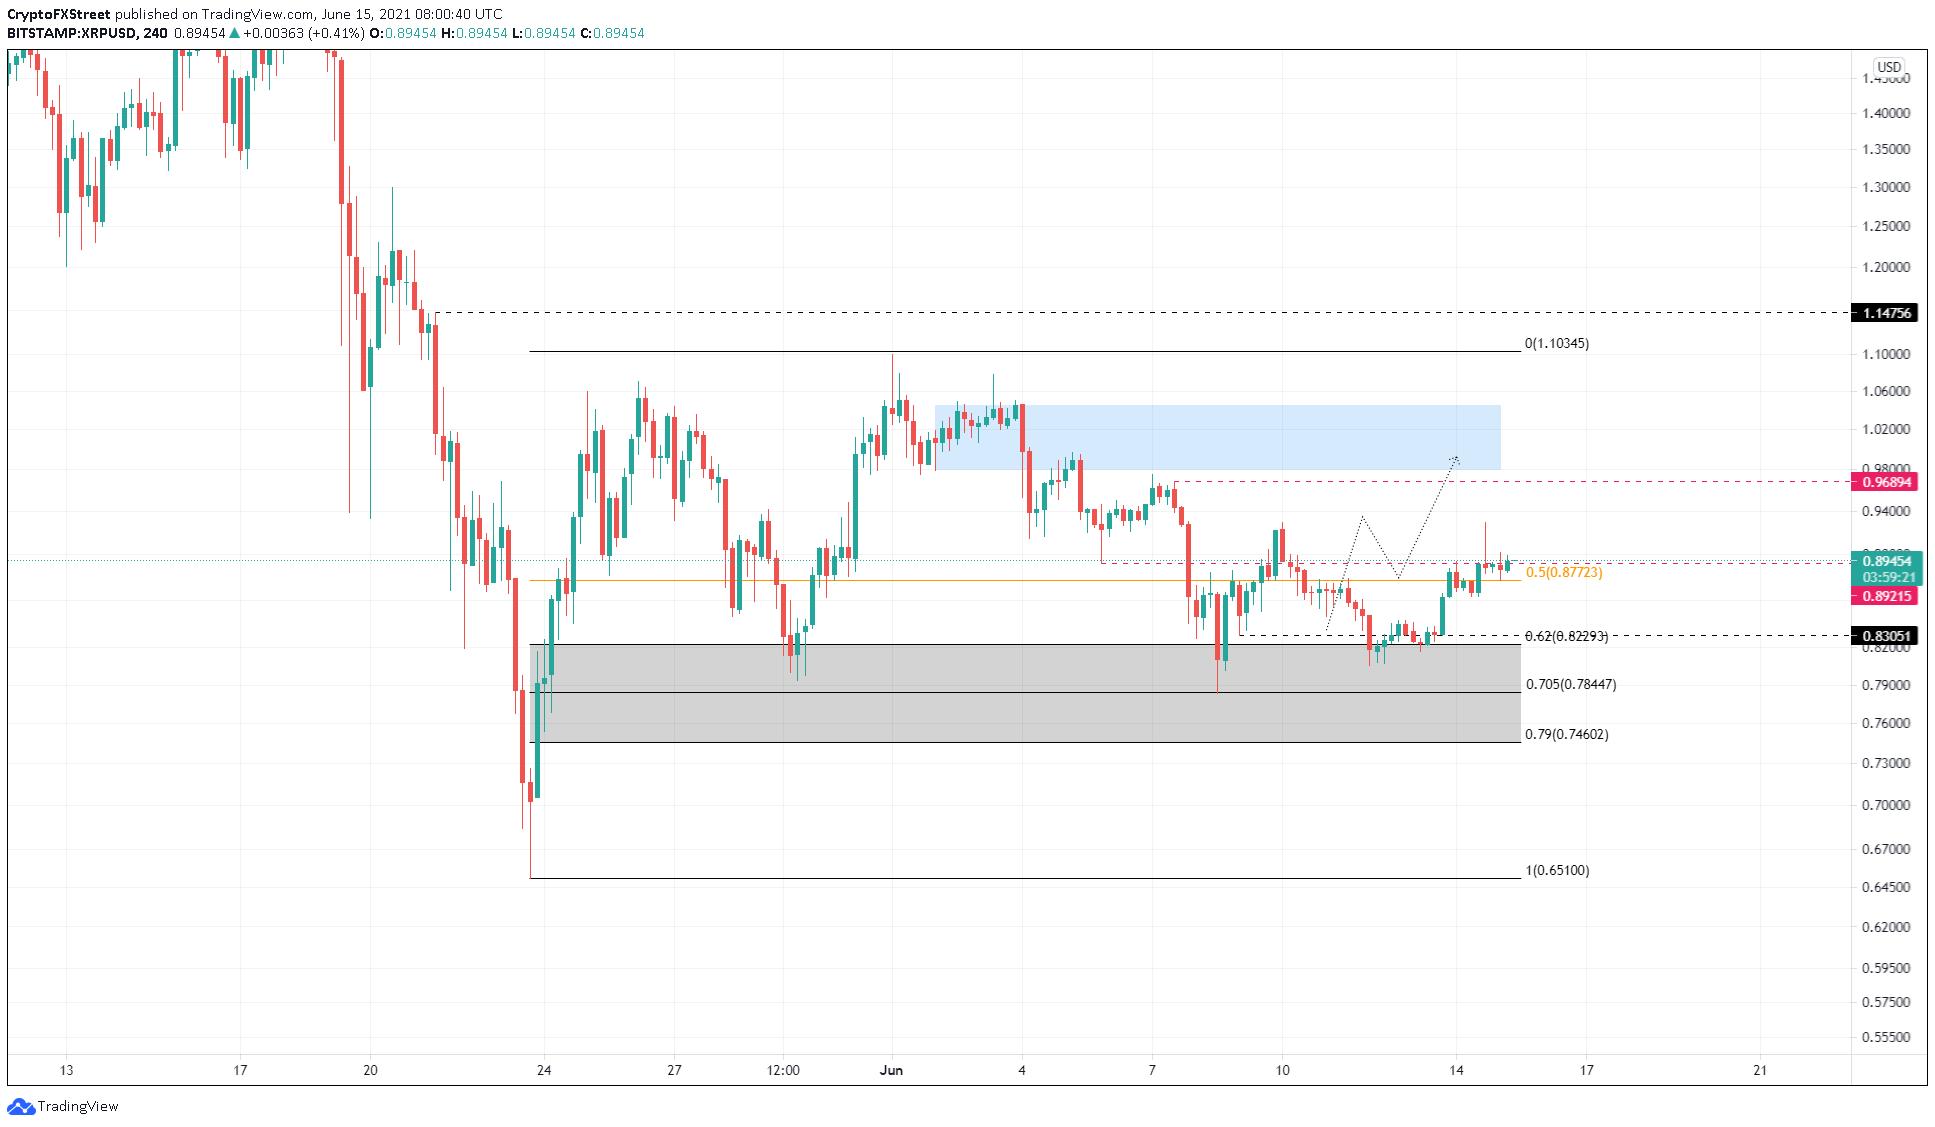 XRP/USDT 4-hour chart